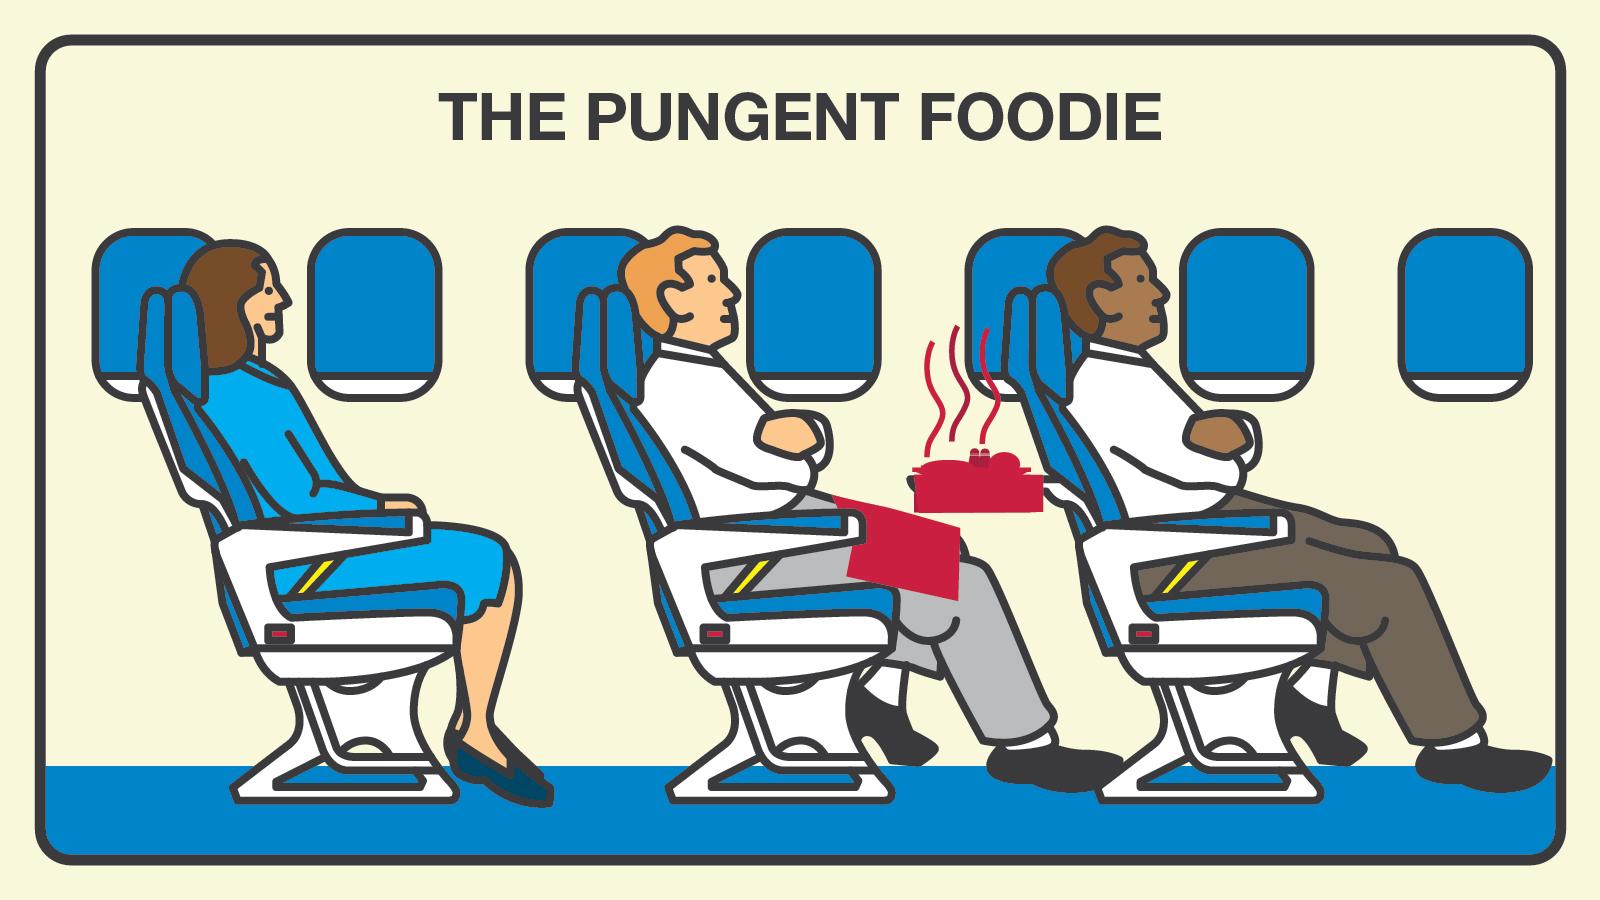 Astounding Window Seat Or Aisle Seat Cnn Staffers Debate Airplane Alphanode Cool Chair Designs And Ideas Alphanodeonline